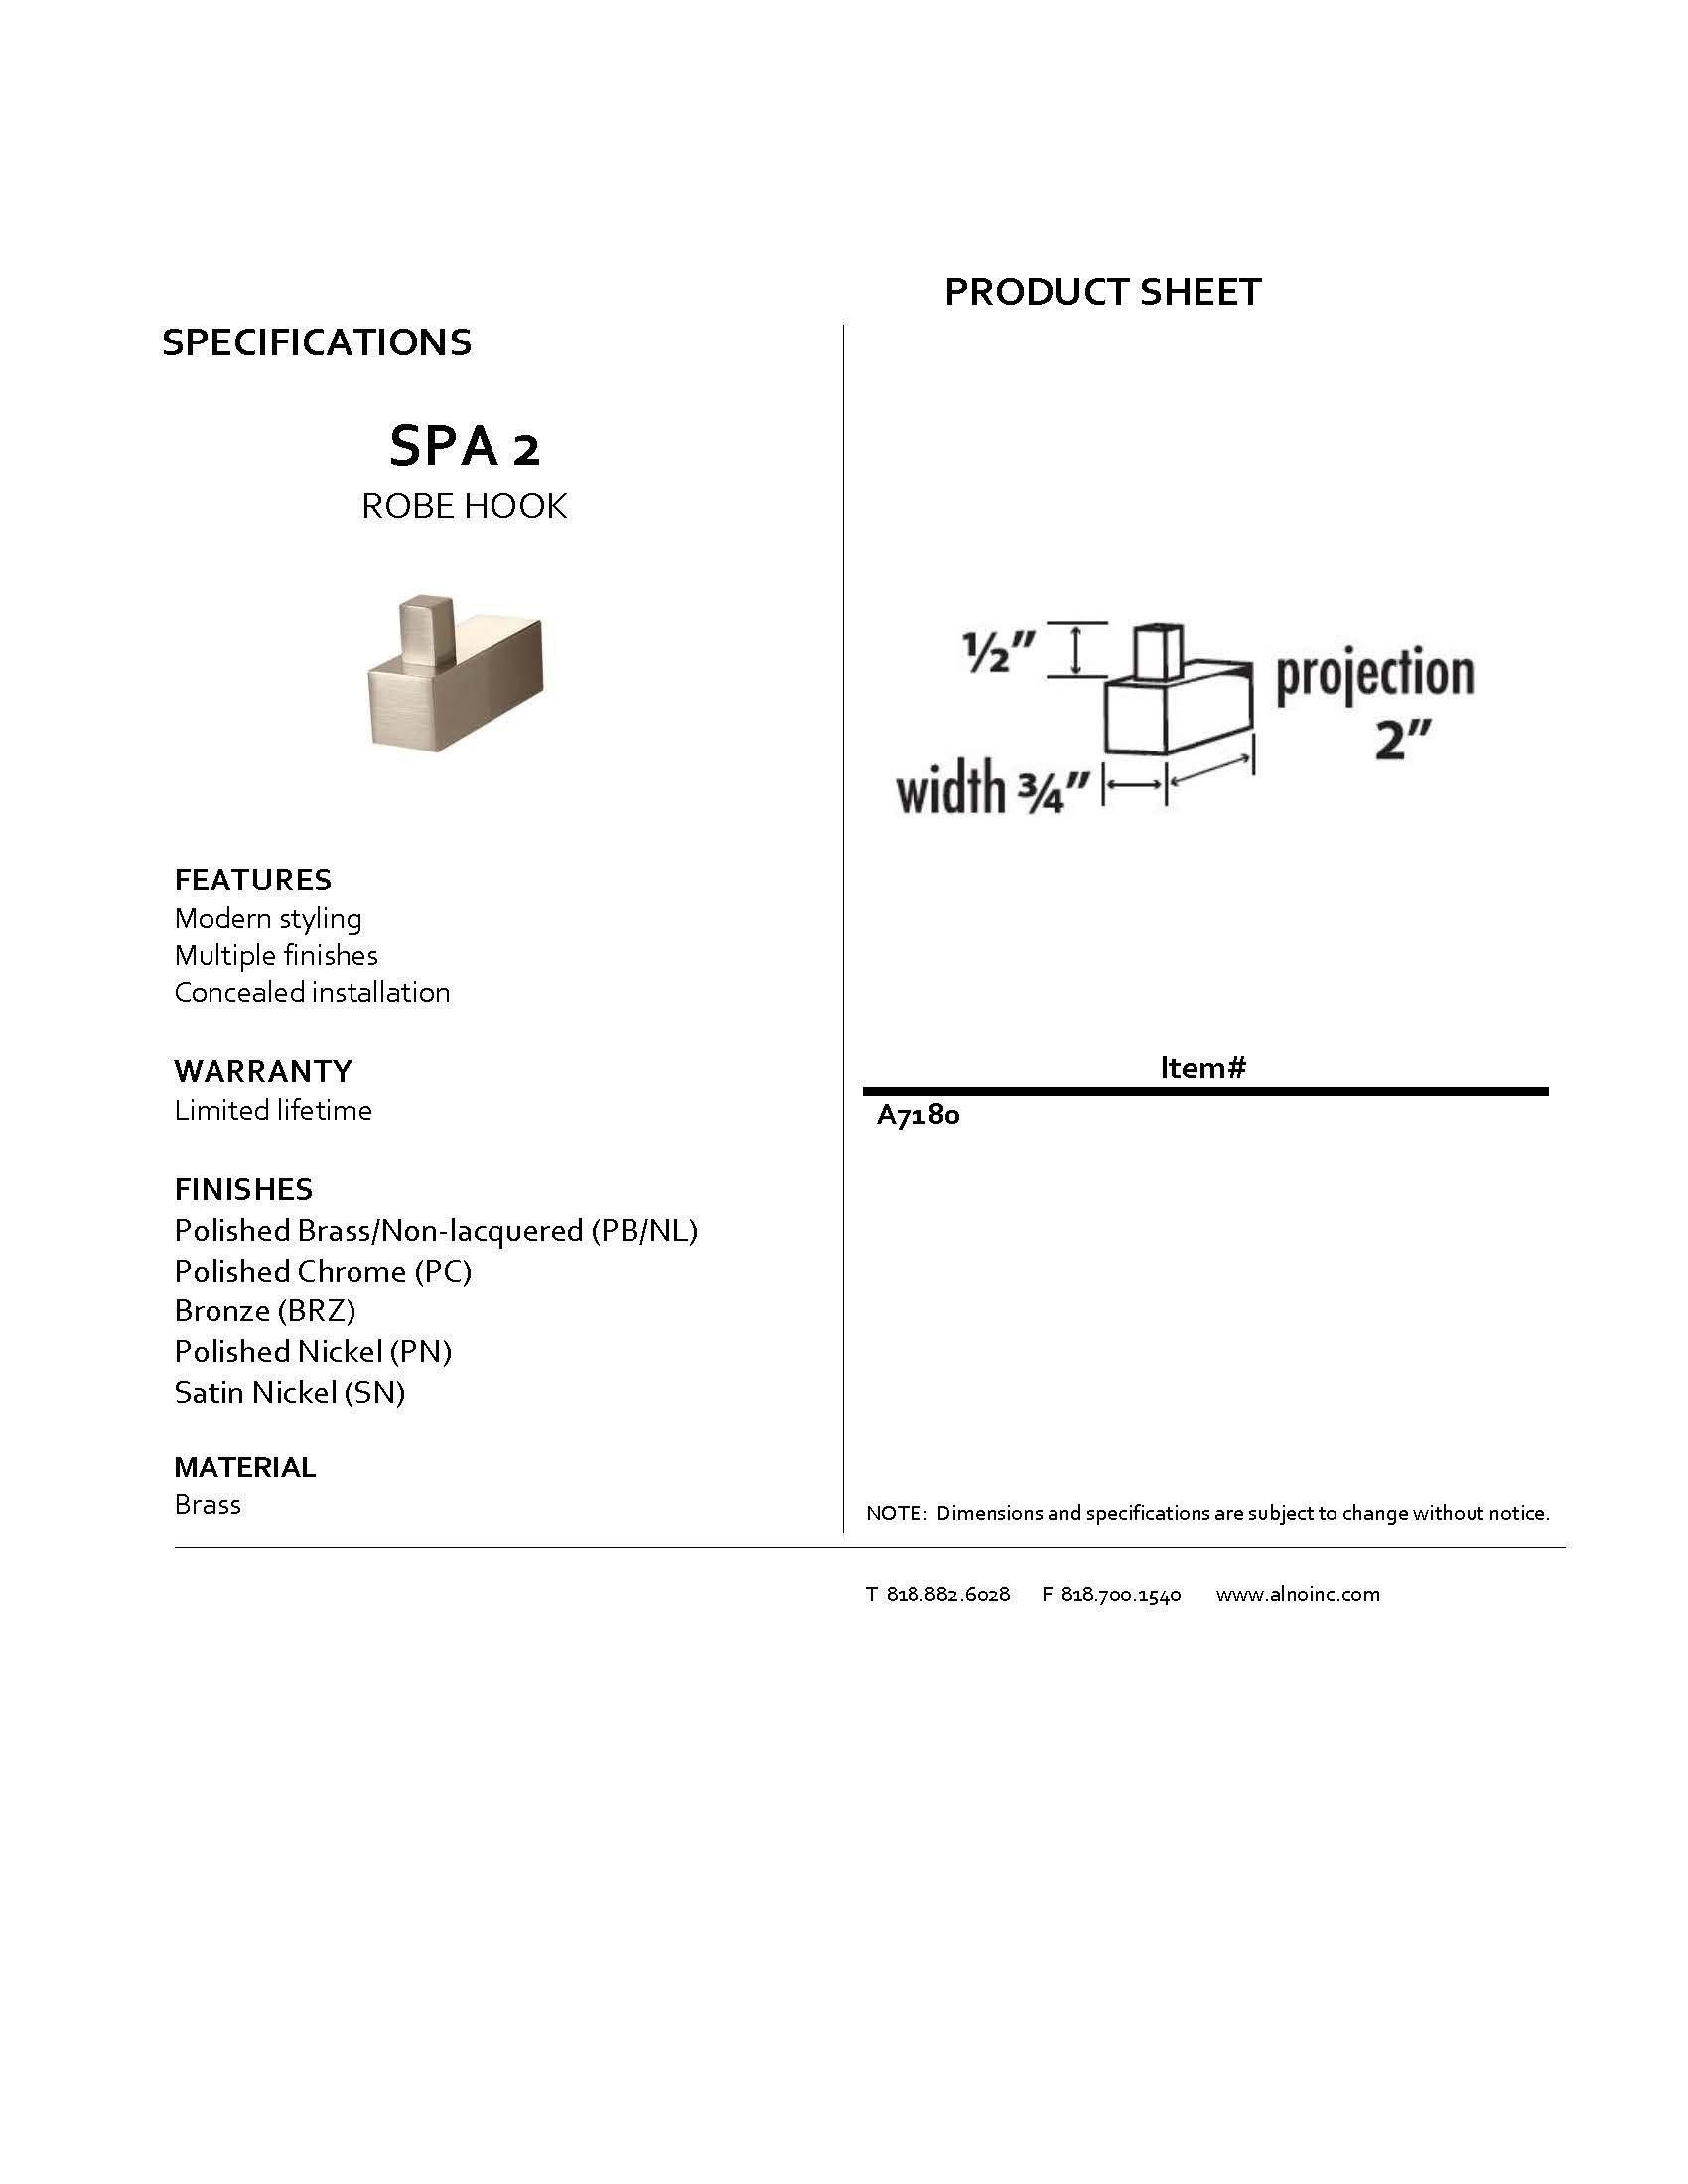 Alno A7180-PN Spa 2 Modern Robe Hooks, Polished Nickel